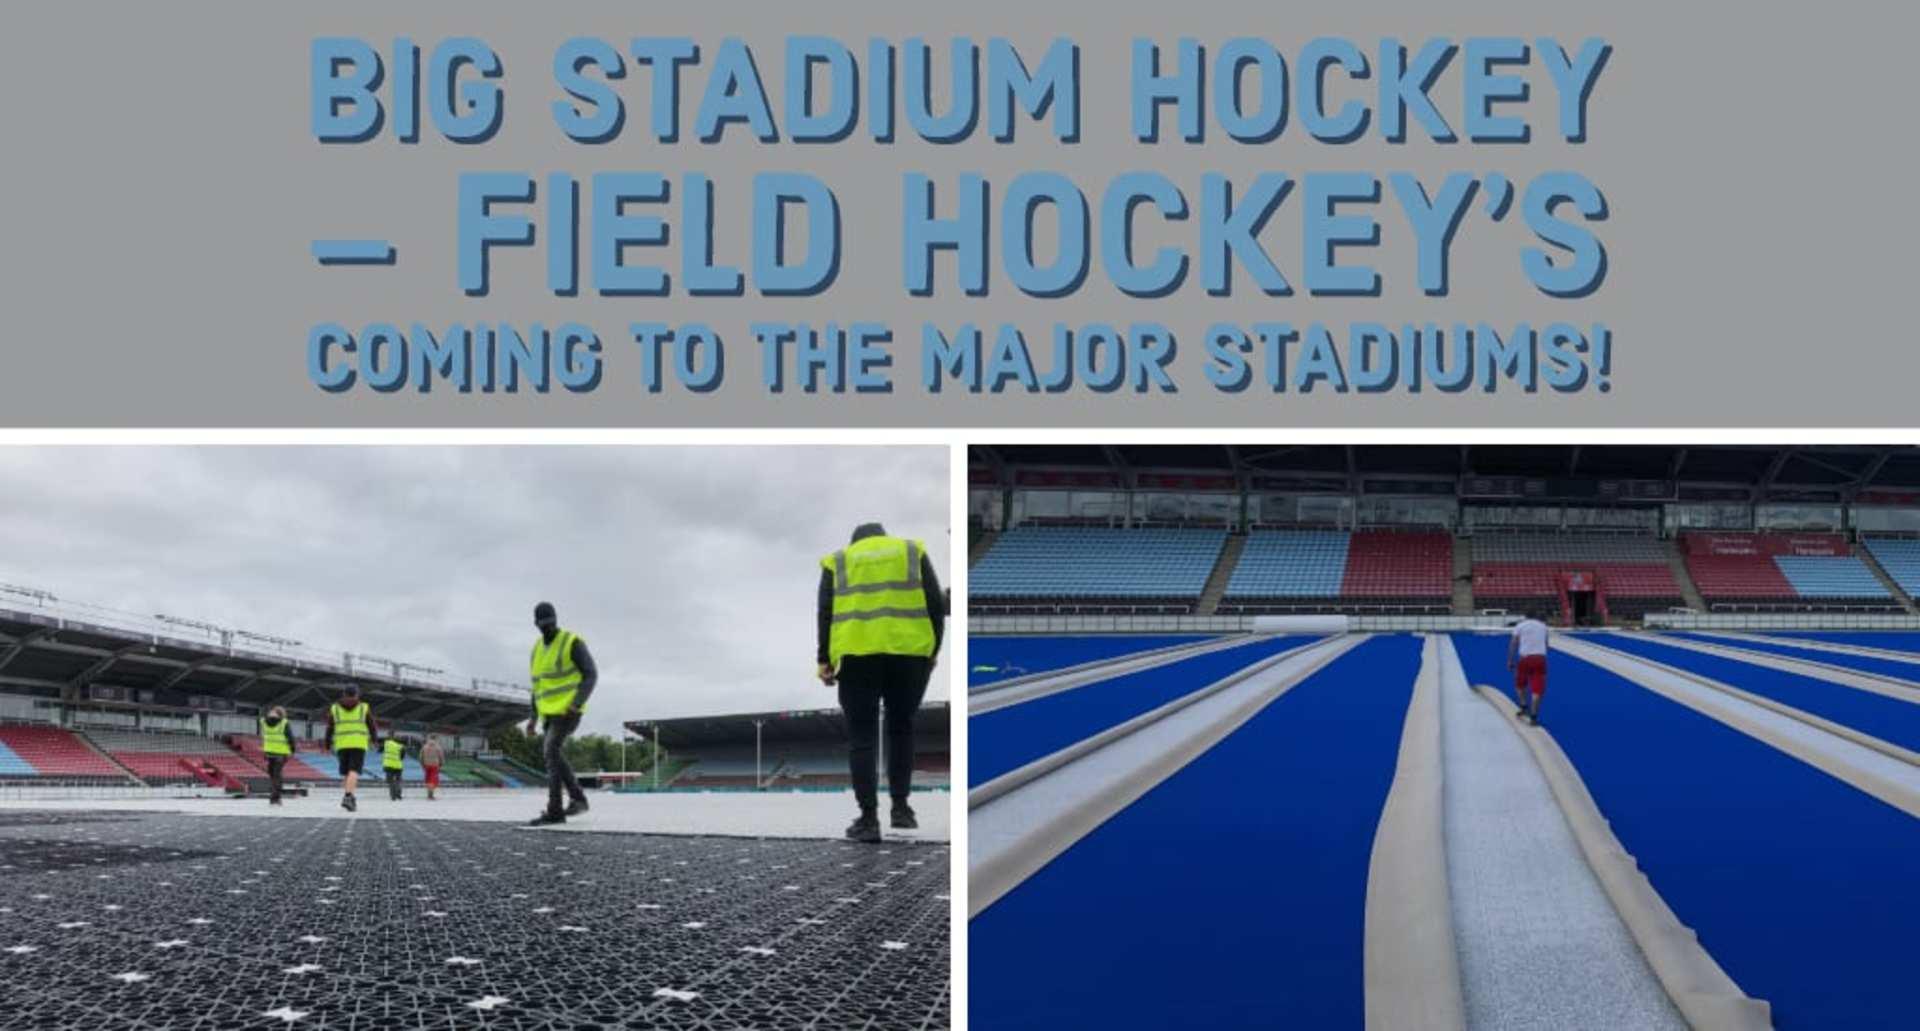 Big Stadium Hockey – field hockey's coming to the major stadiums!